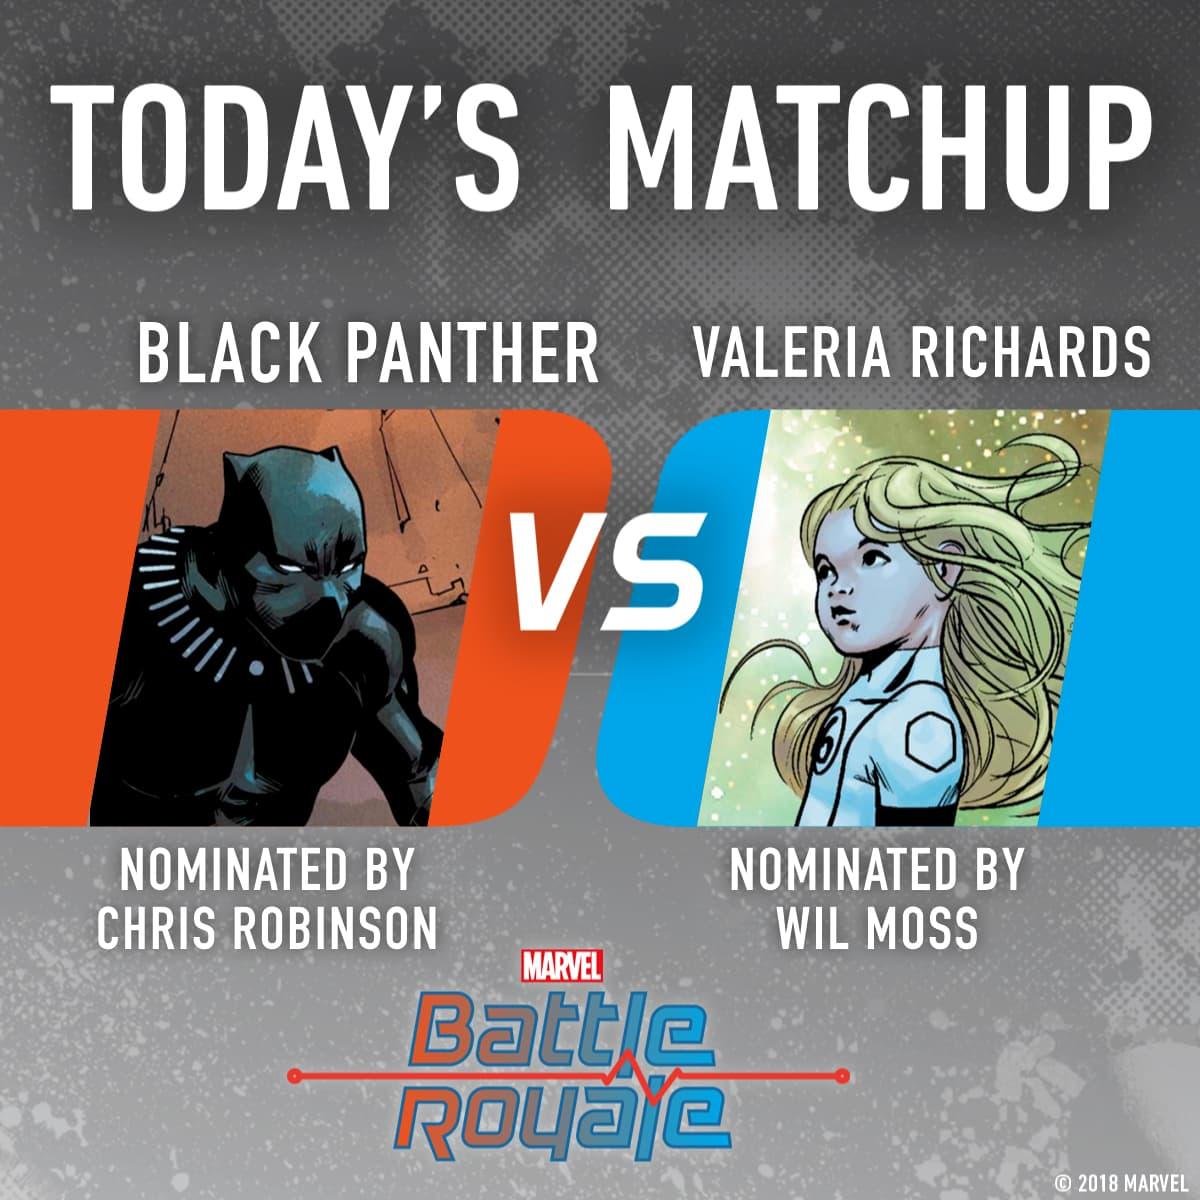 Black Panther vs. Valeria Richards